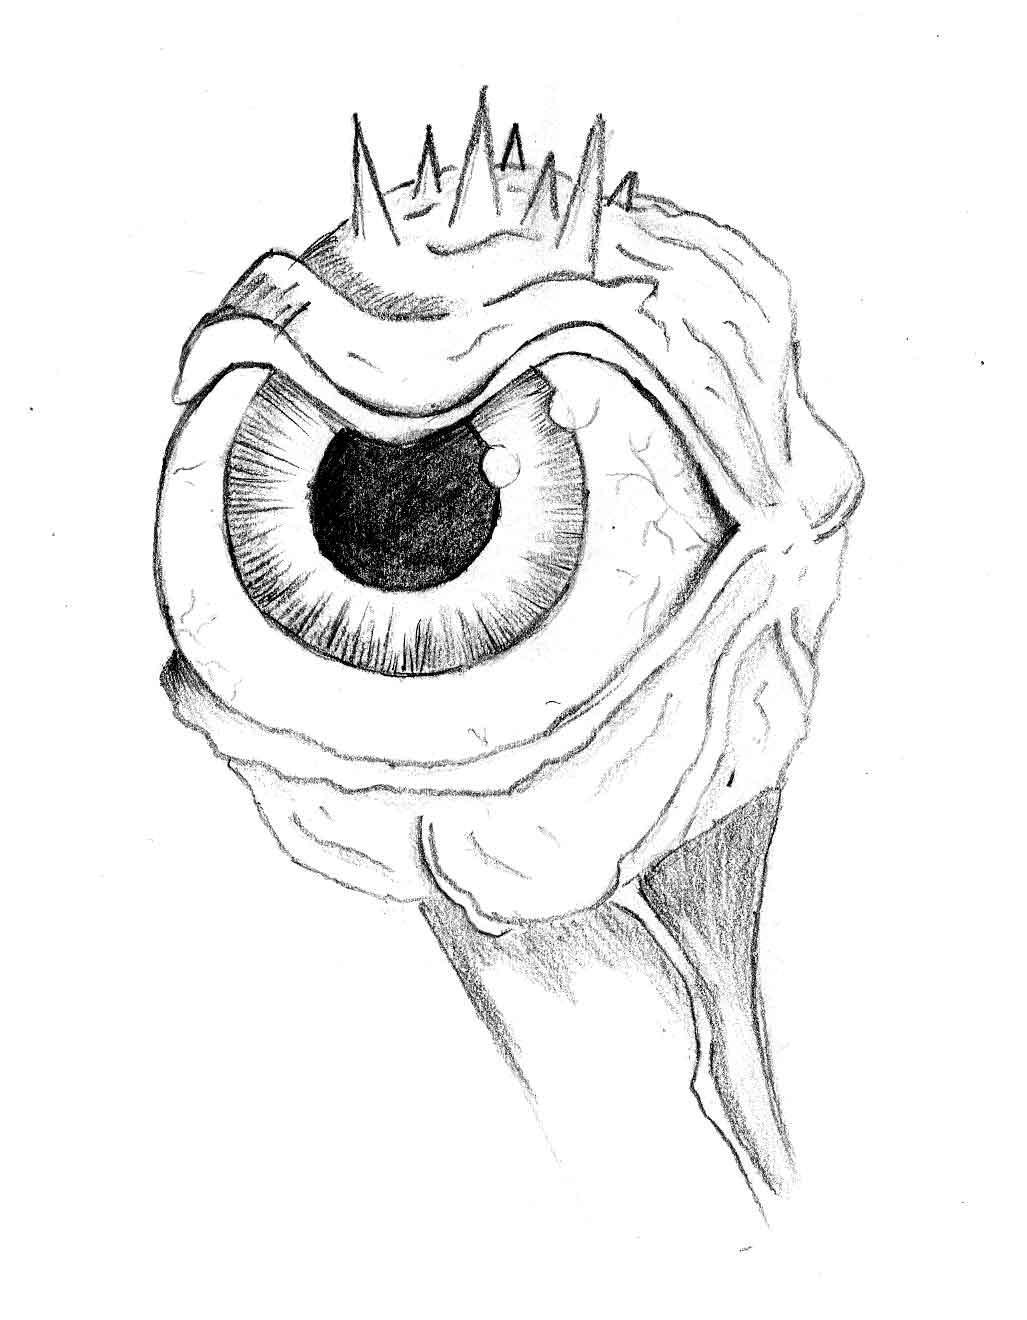 Evil eye by FantasyArt on DeviantArt